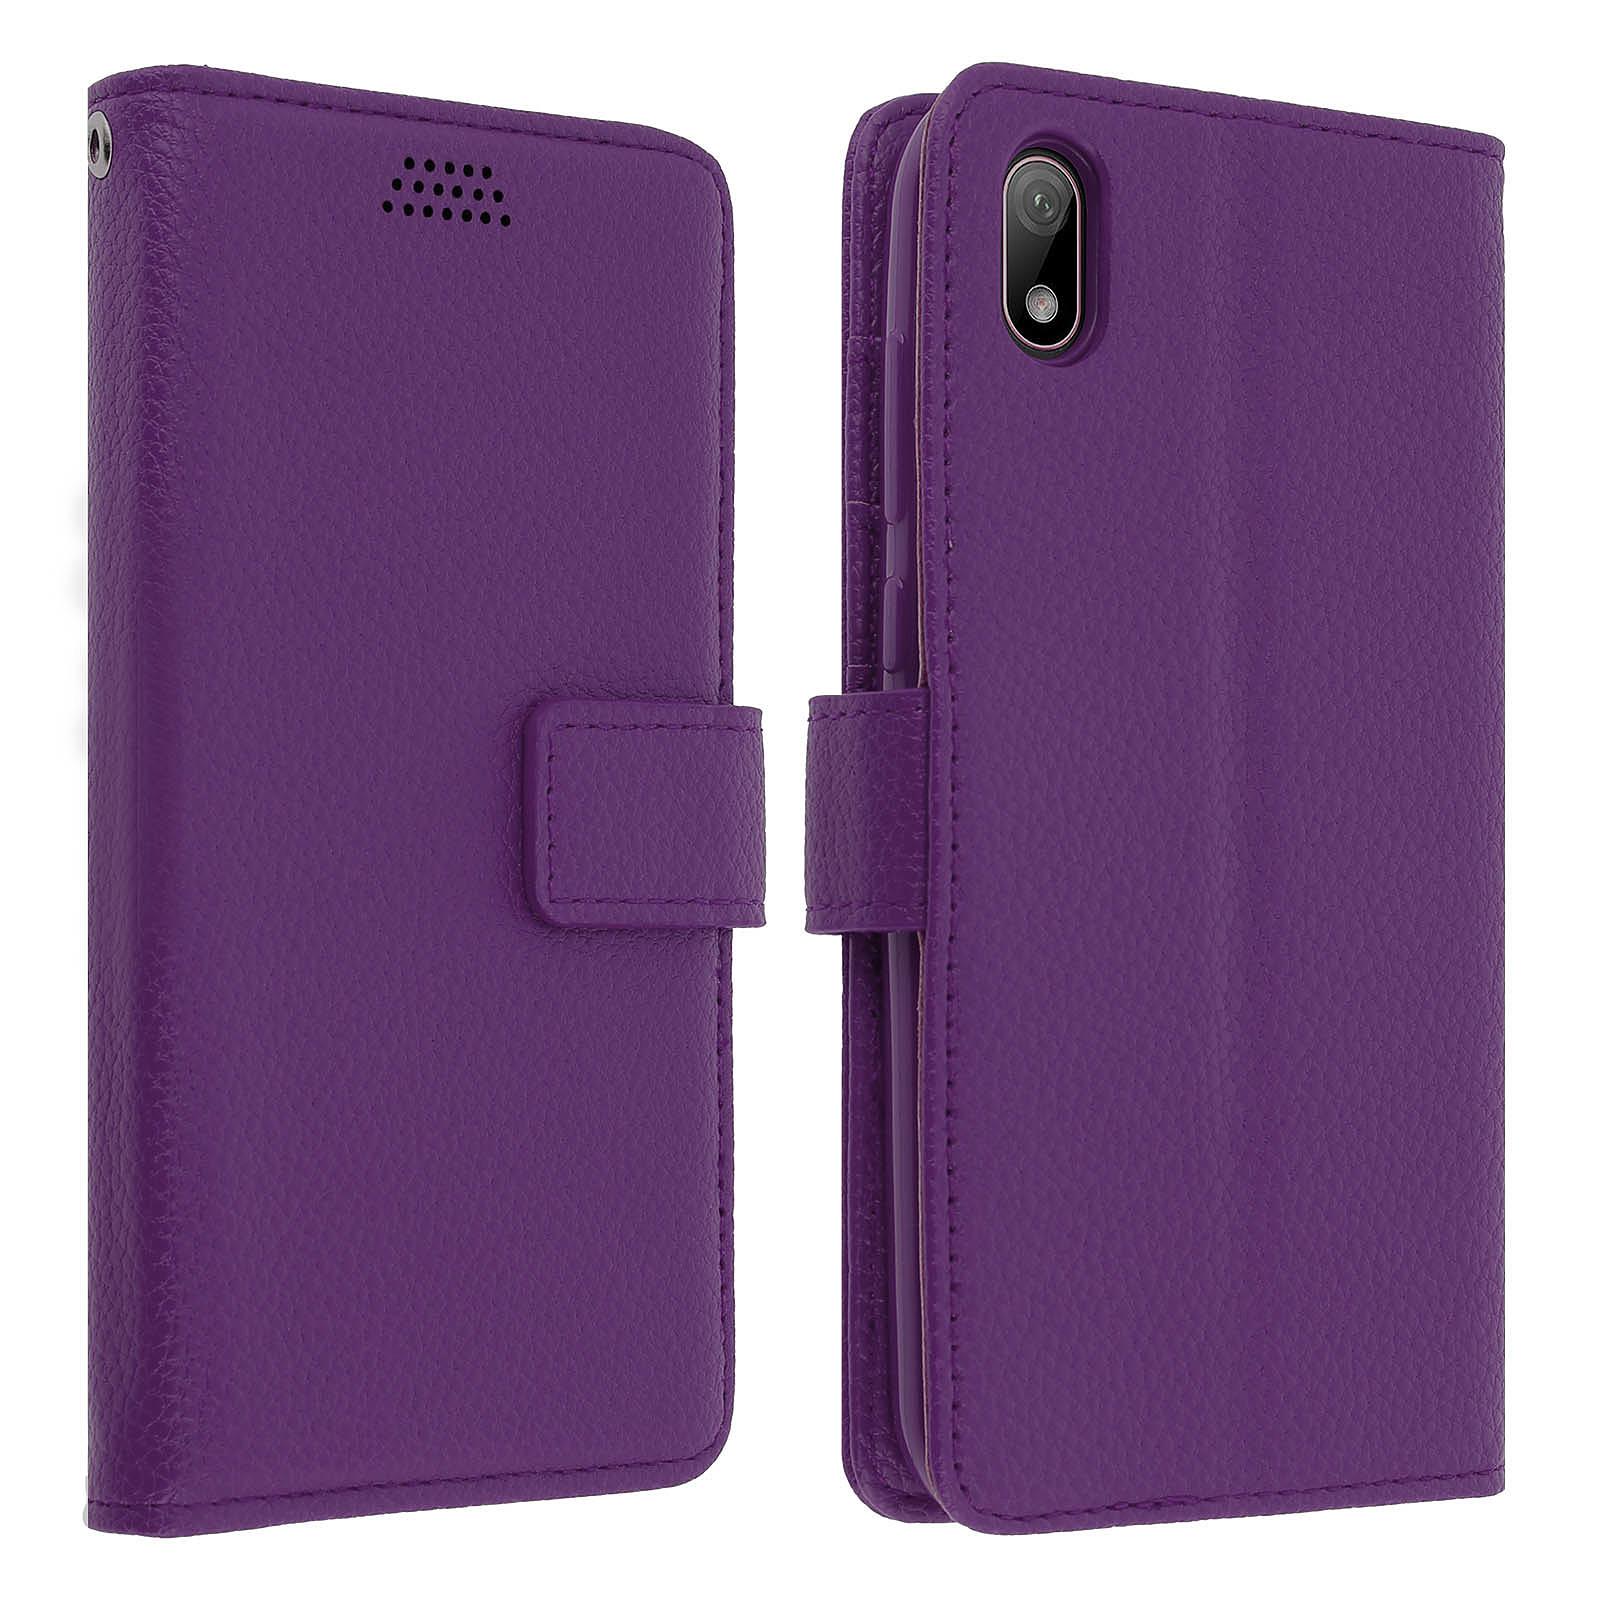 Avizar Etui folio Violet pour Huawei Y5 2019 , Honor 8S